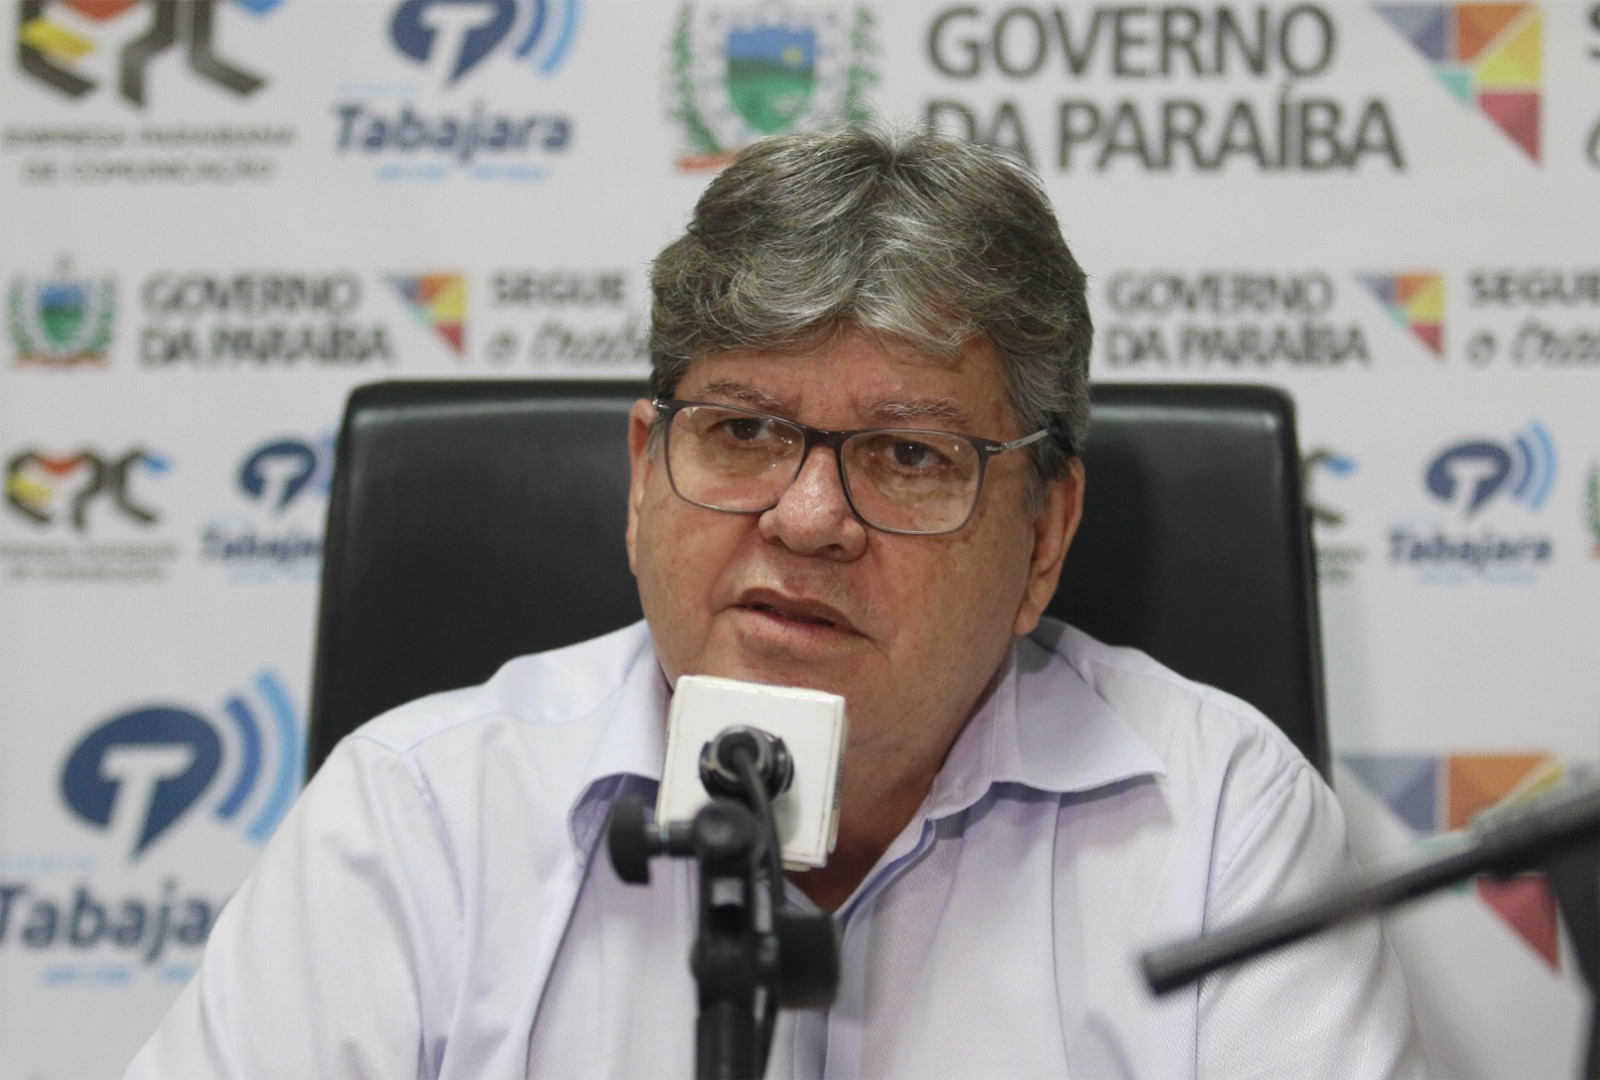 joao-azevedo-no-programa-fala-governador_foto-francisco-franca-1.jpg